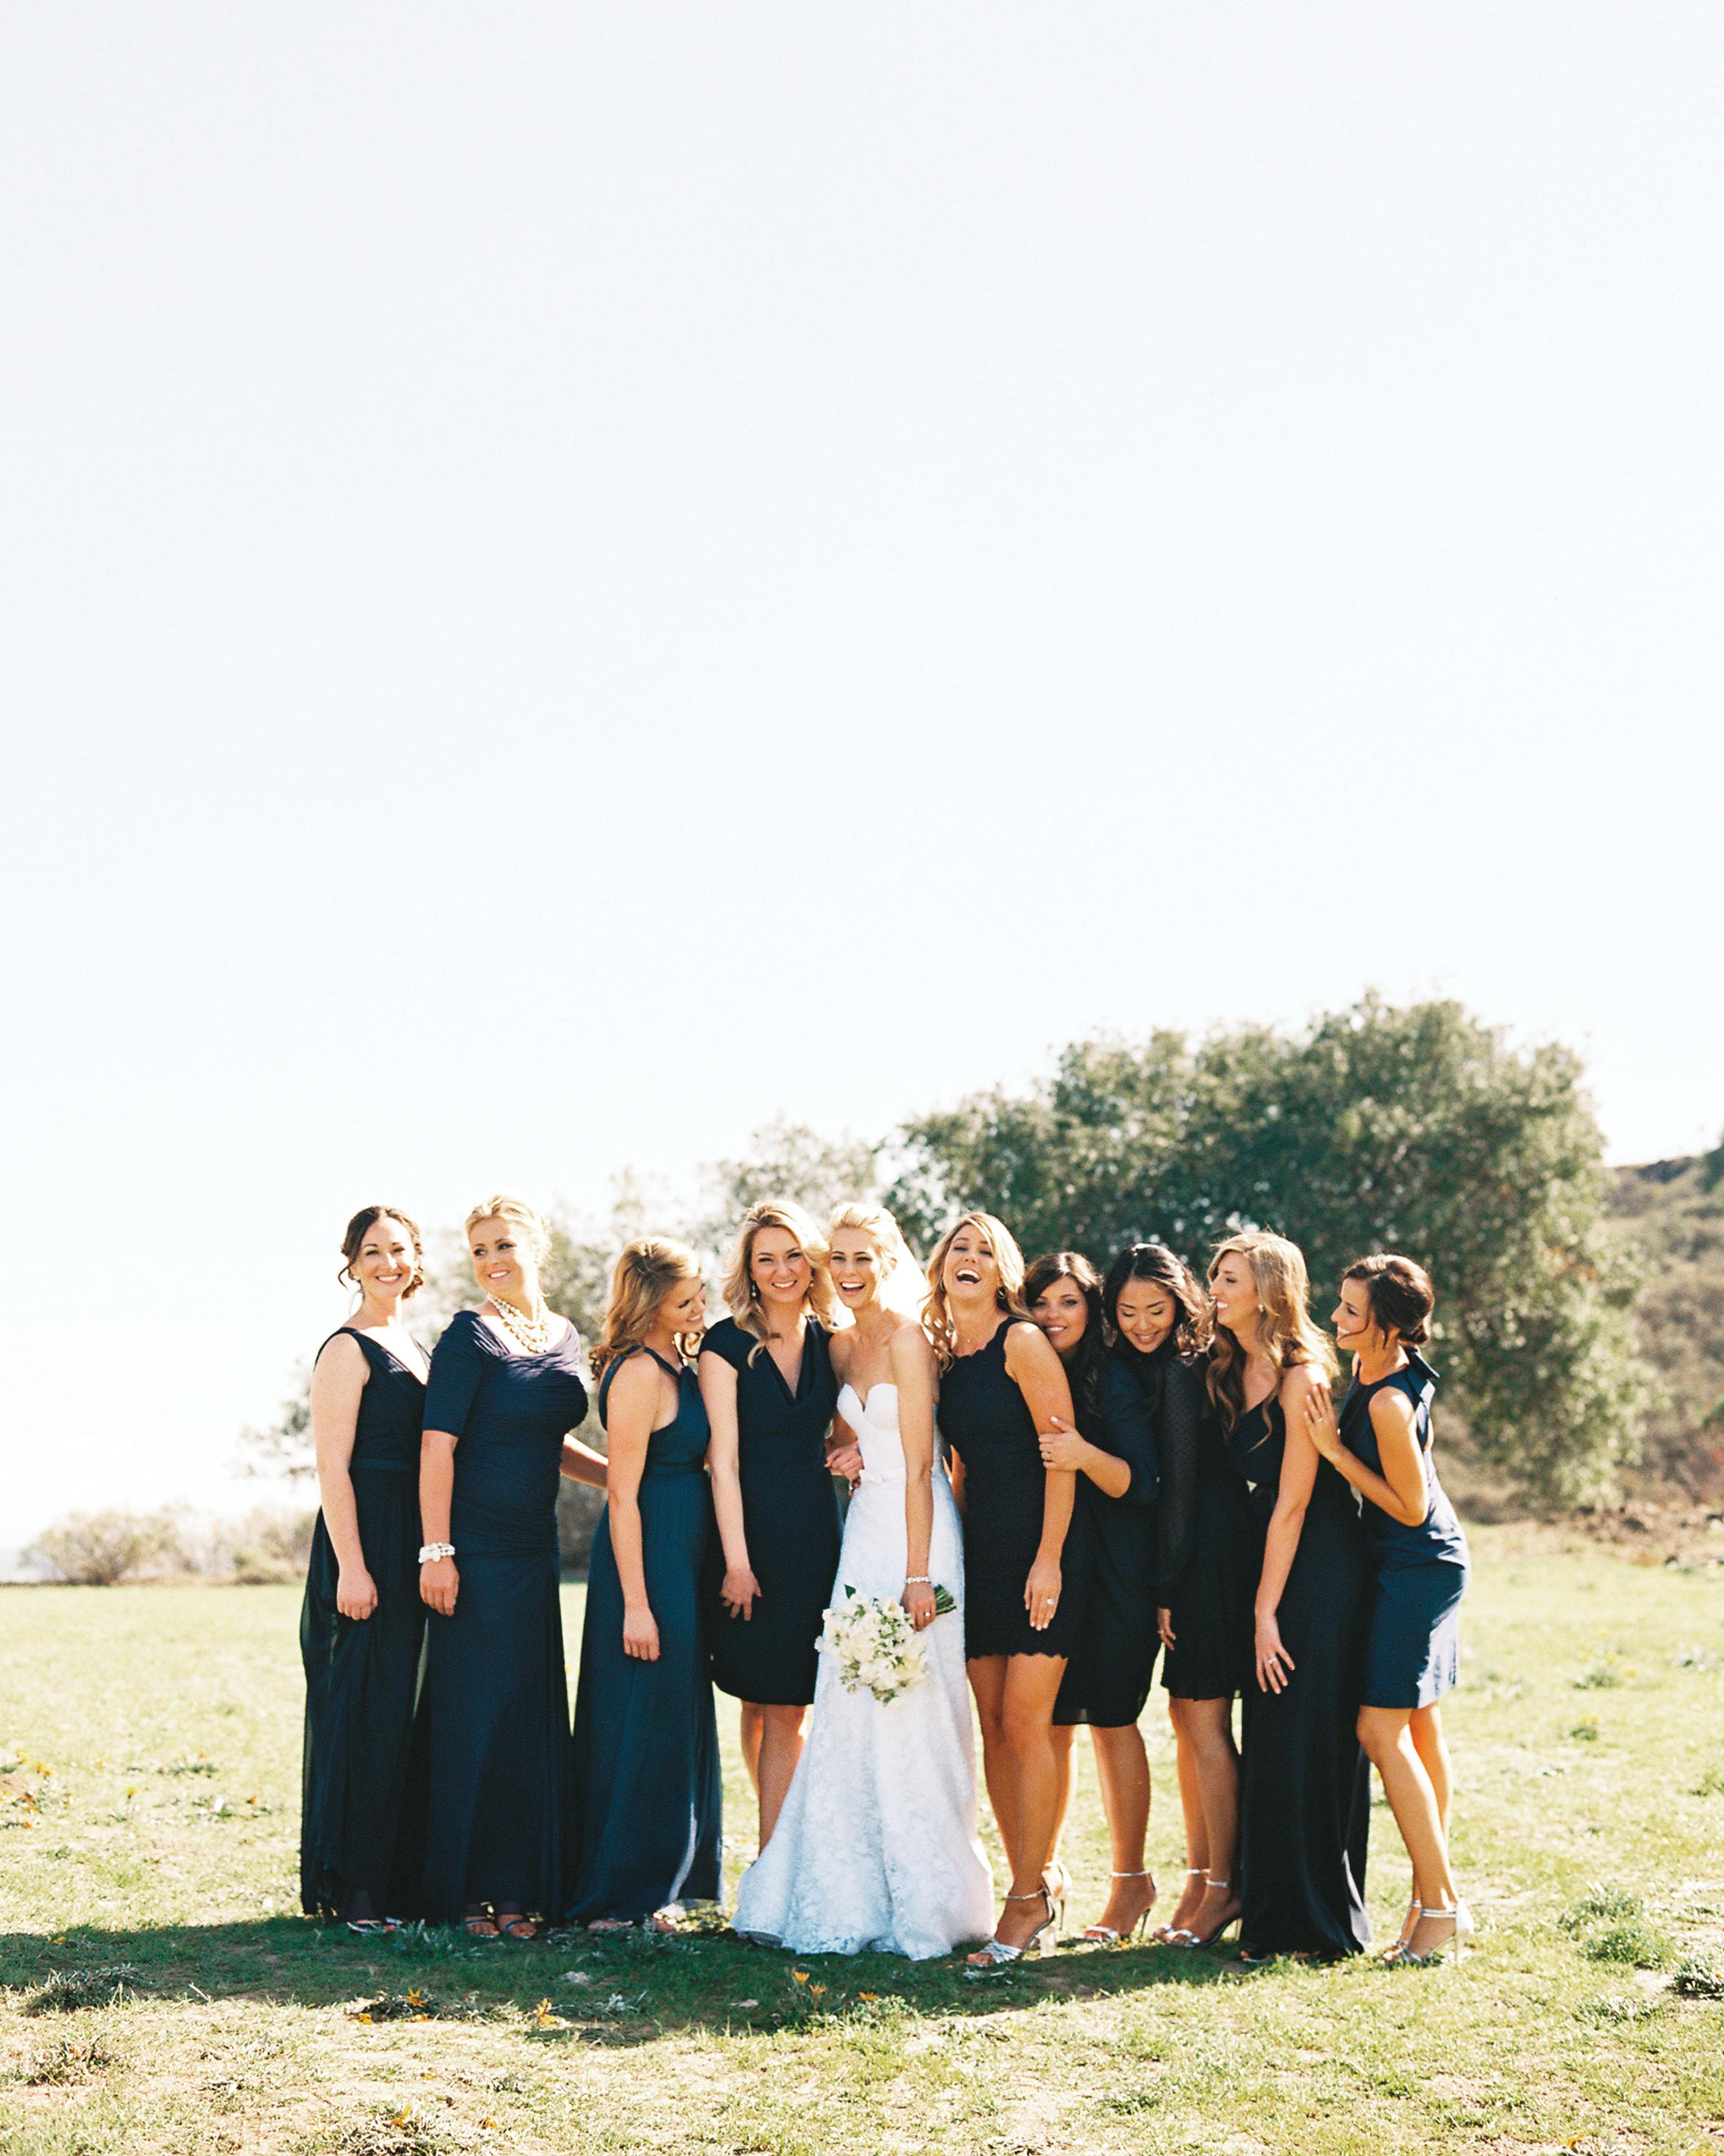 brooke-shea-wedding-300-d111277.jpg